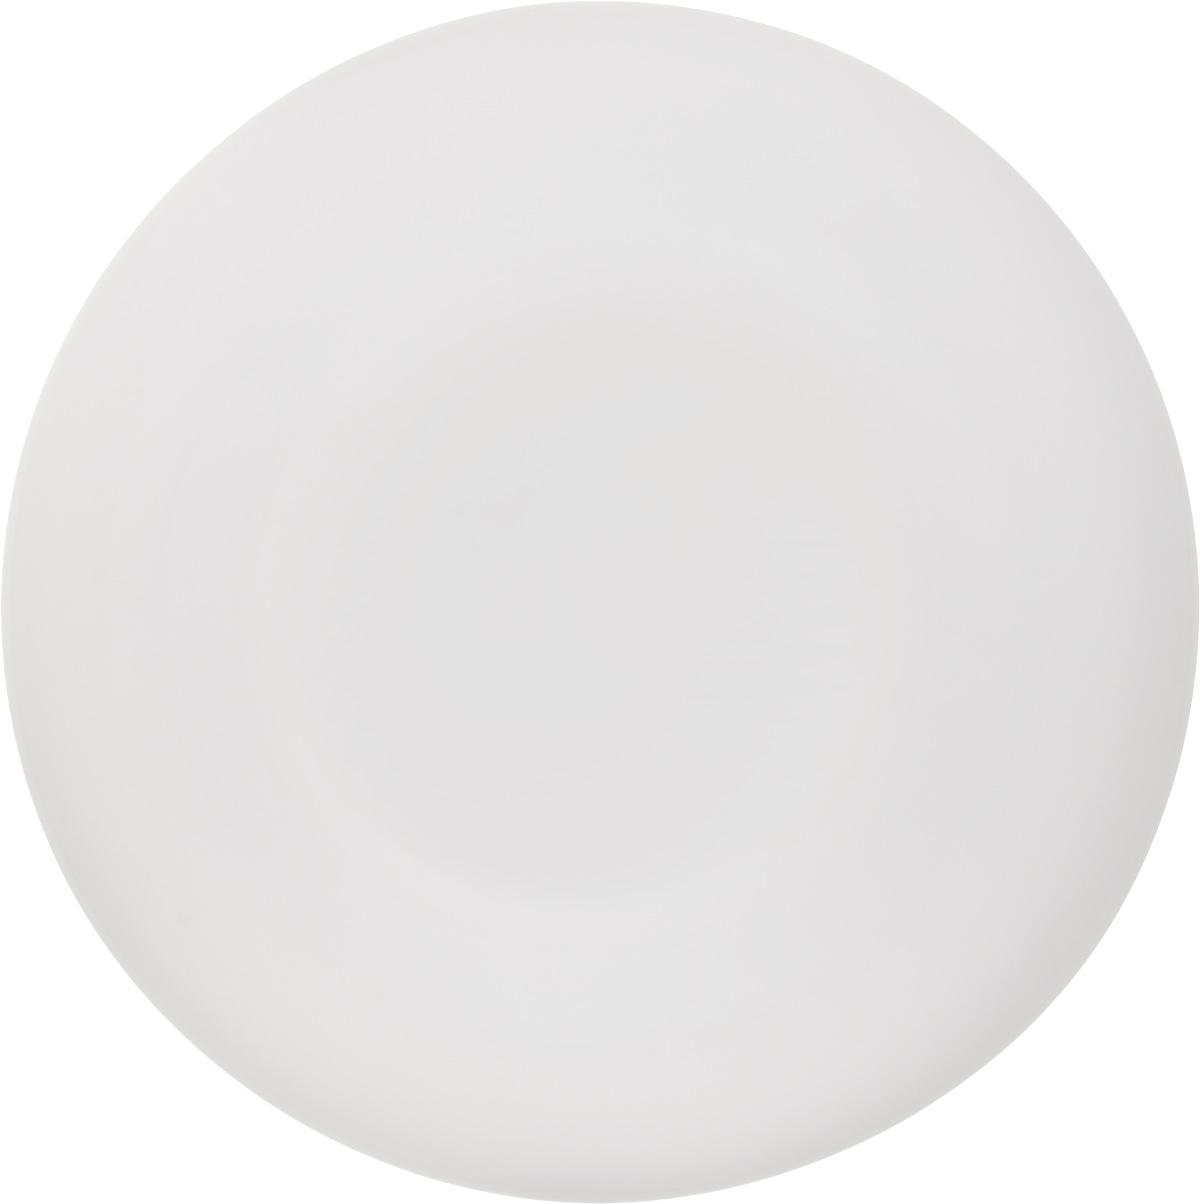 Тарелка обеденная Luminarc Olax, диаметр 25 см тарелка luminarc fizz lemon диаметр 25 см